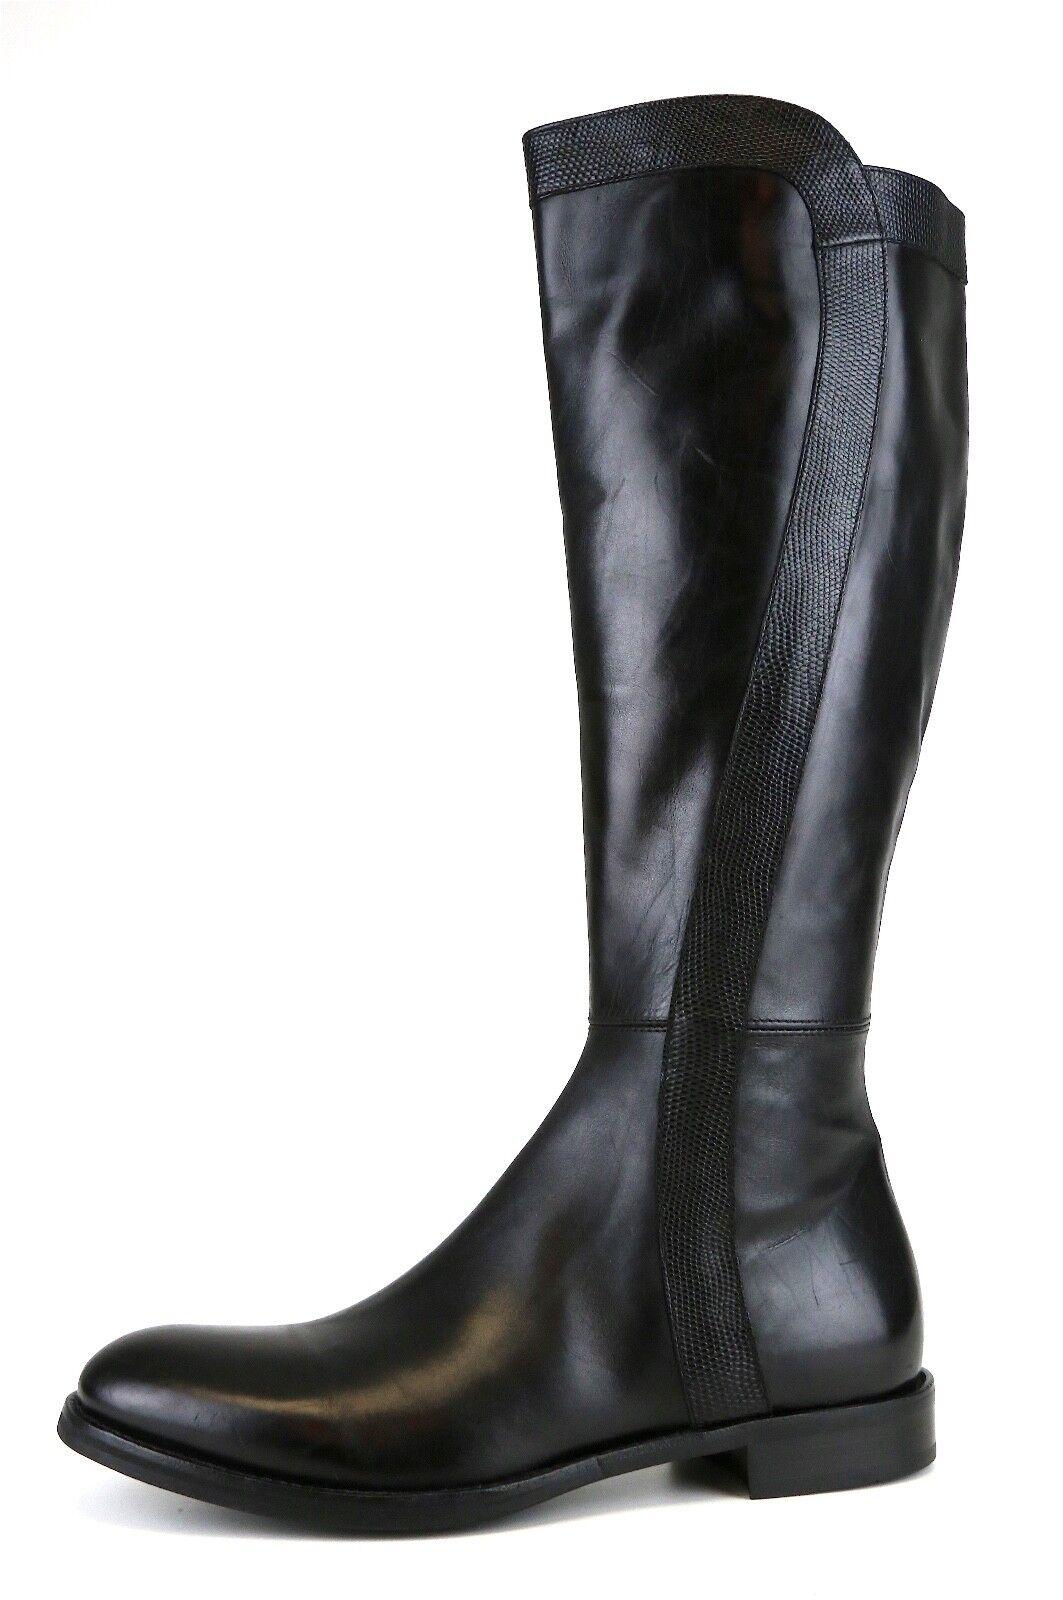 AGL Tall Leather Side Zipper Boot Black Women Sz 40 *